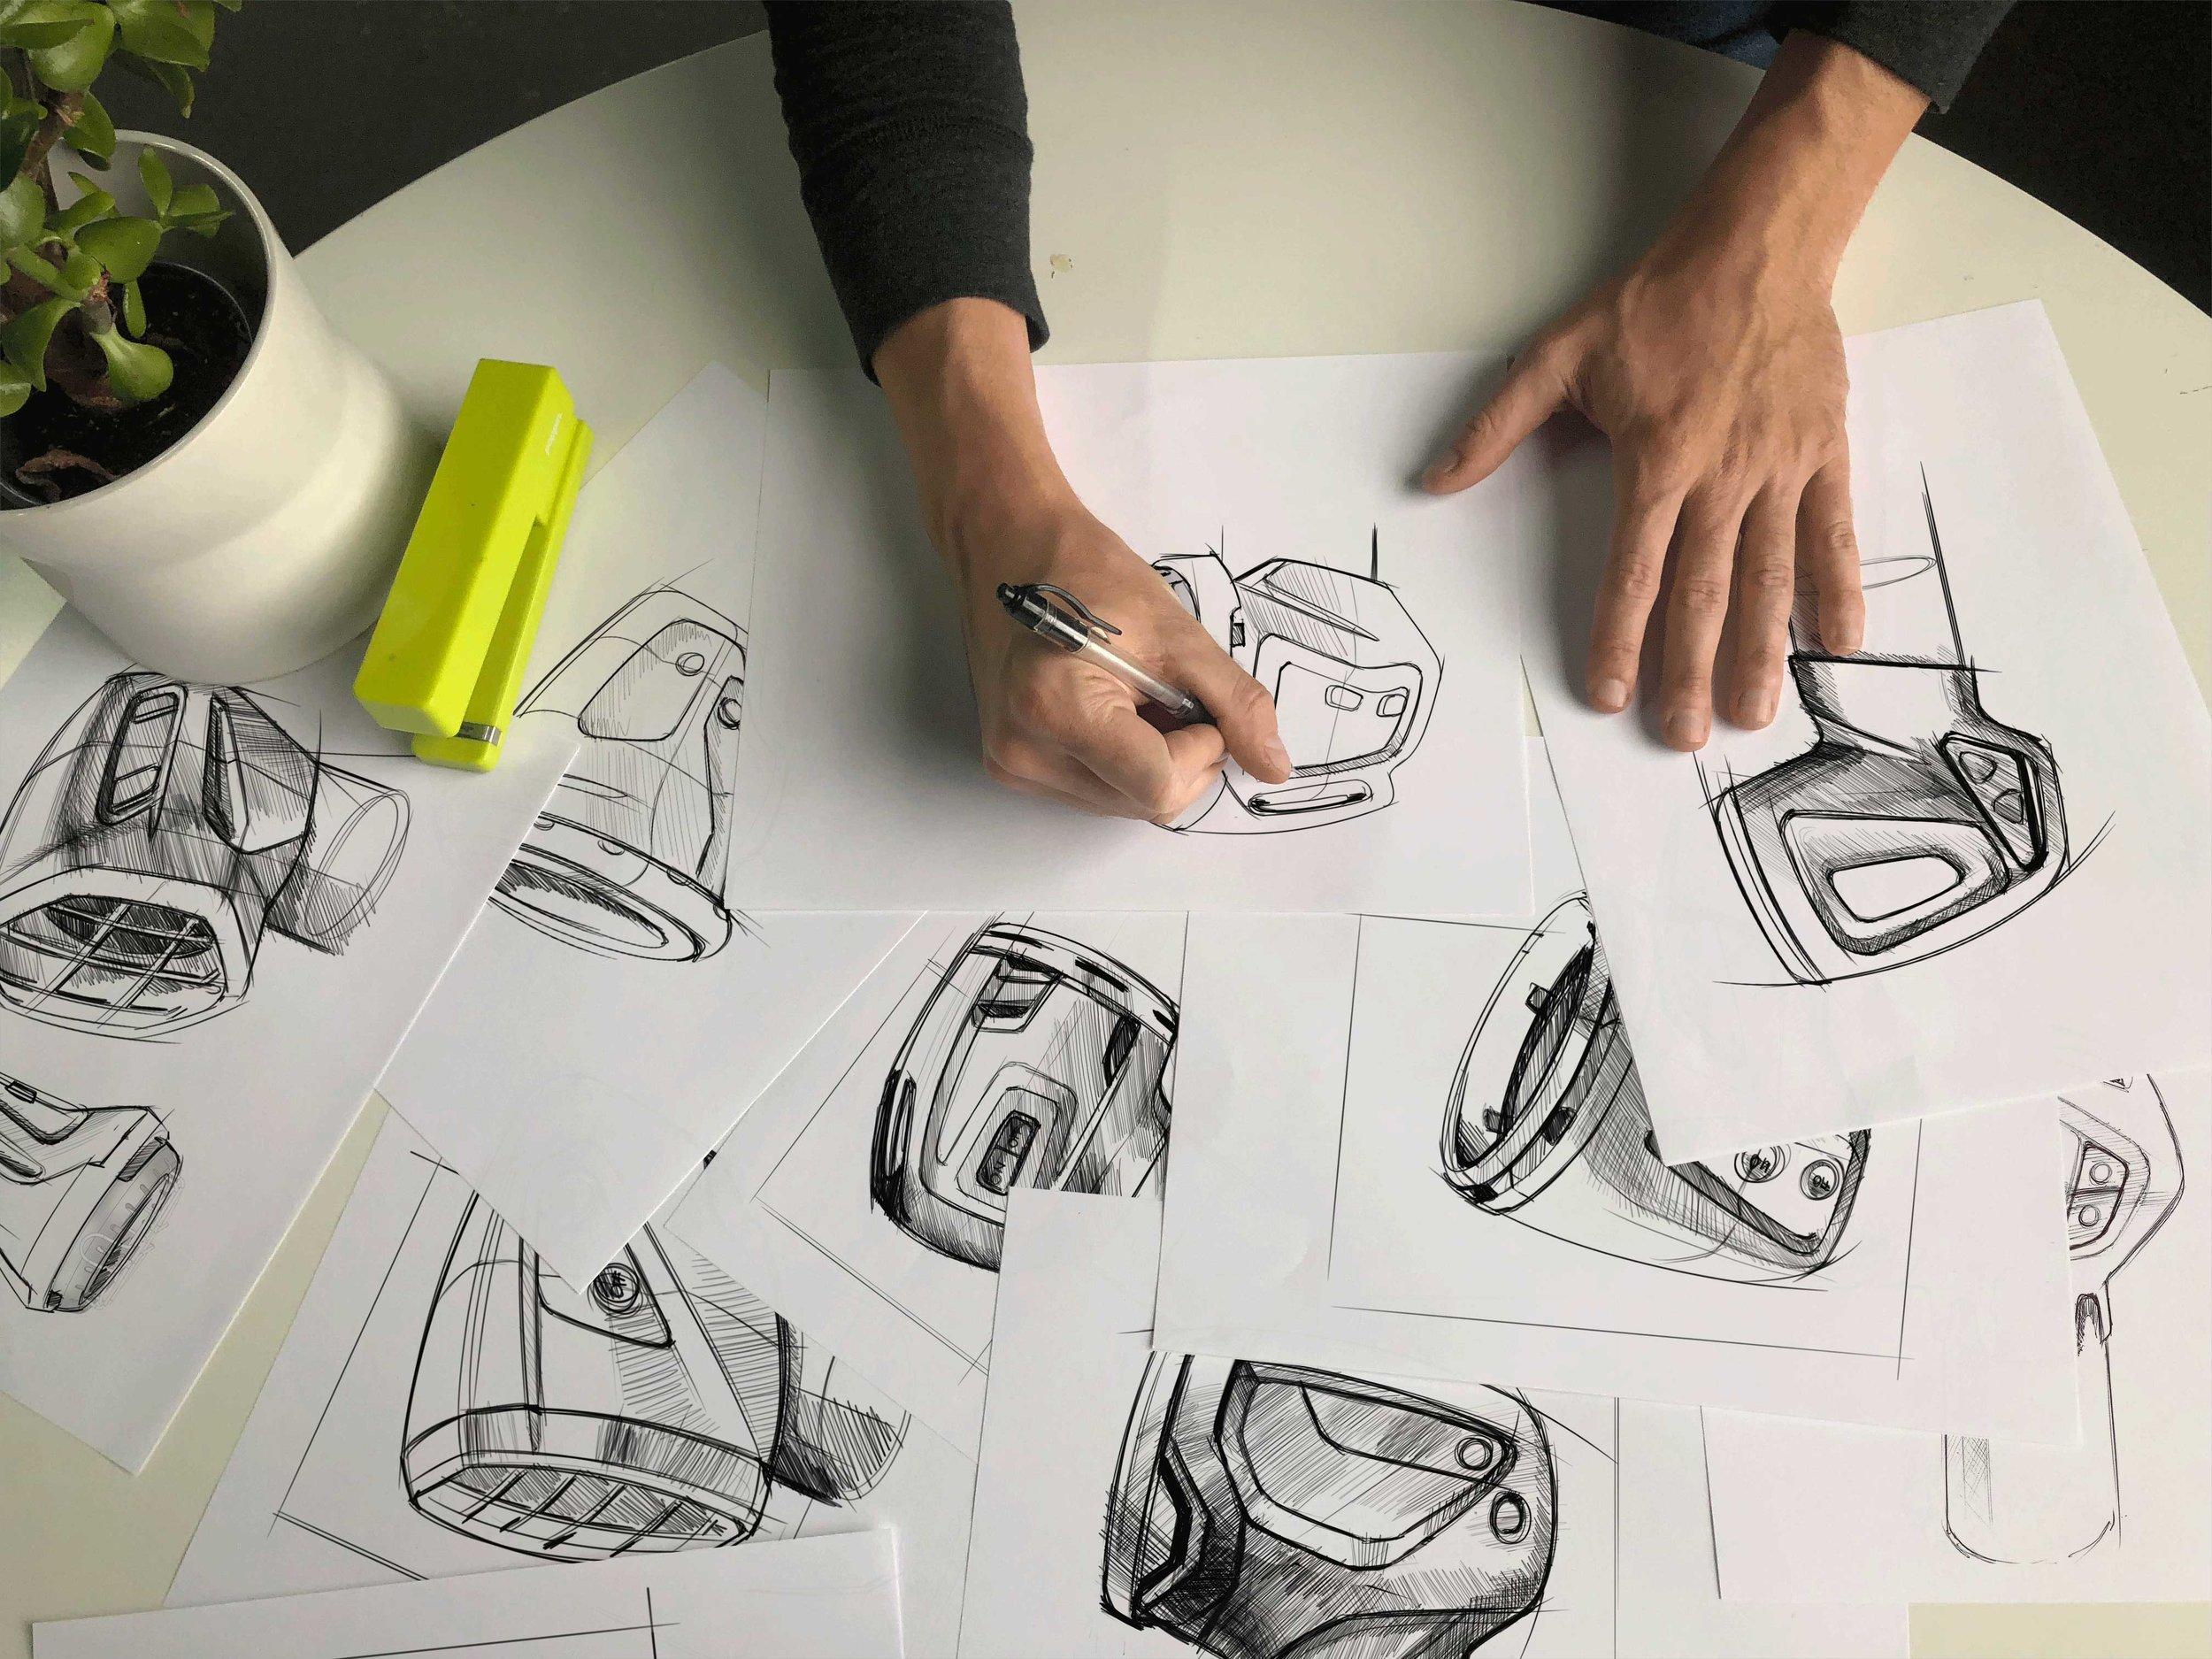 Heater-sketches.jpg